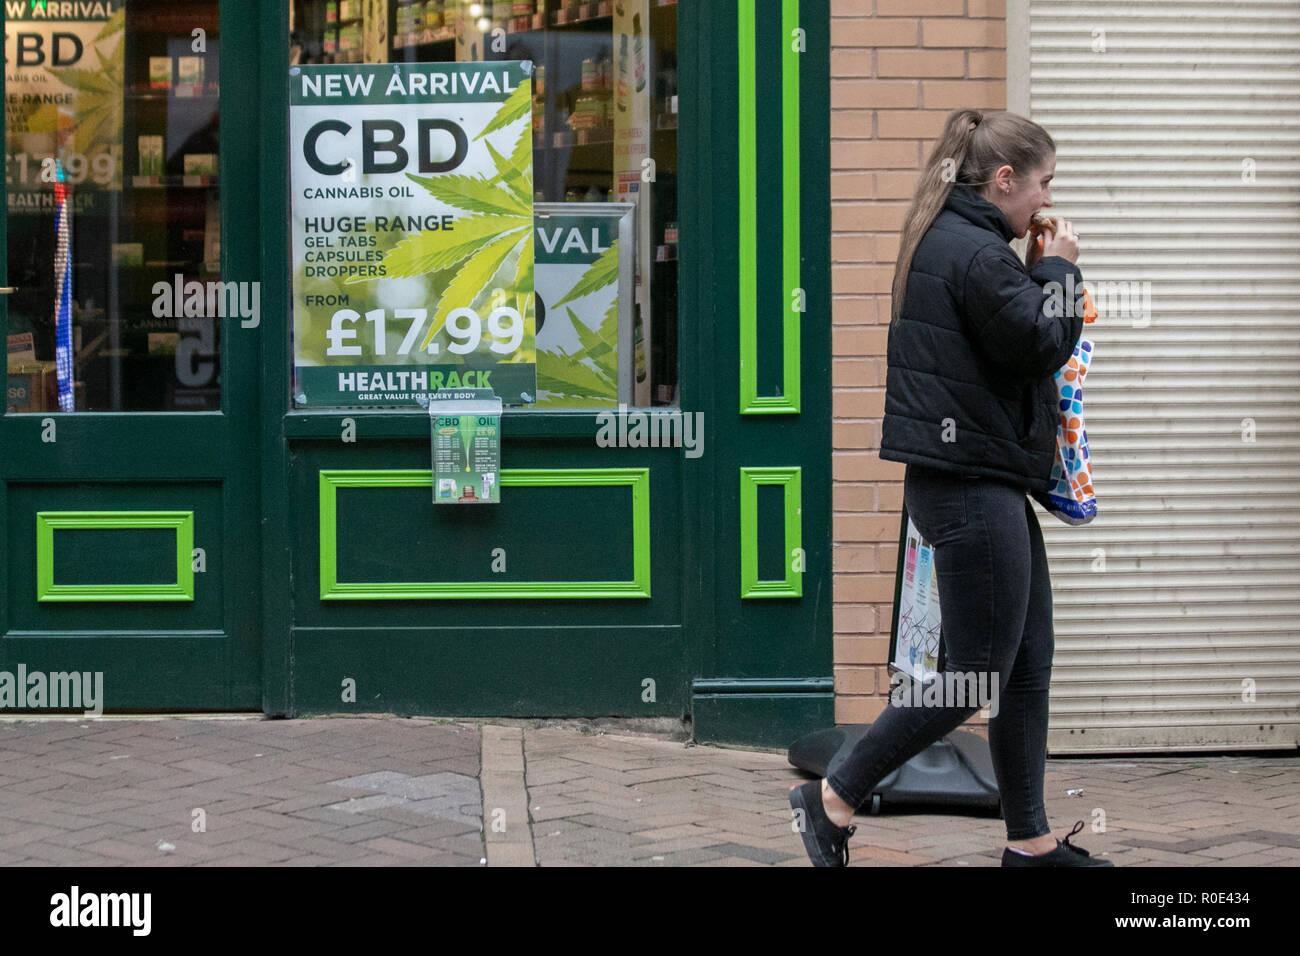 Health Rack commercial sales of Cannabidiol (CBD), marijuana